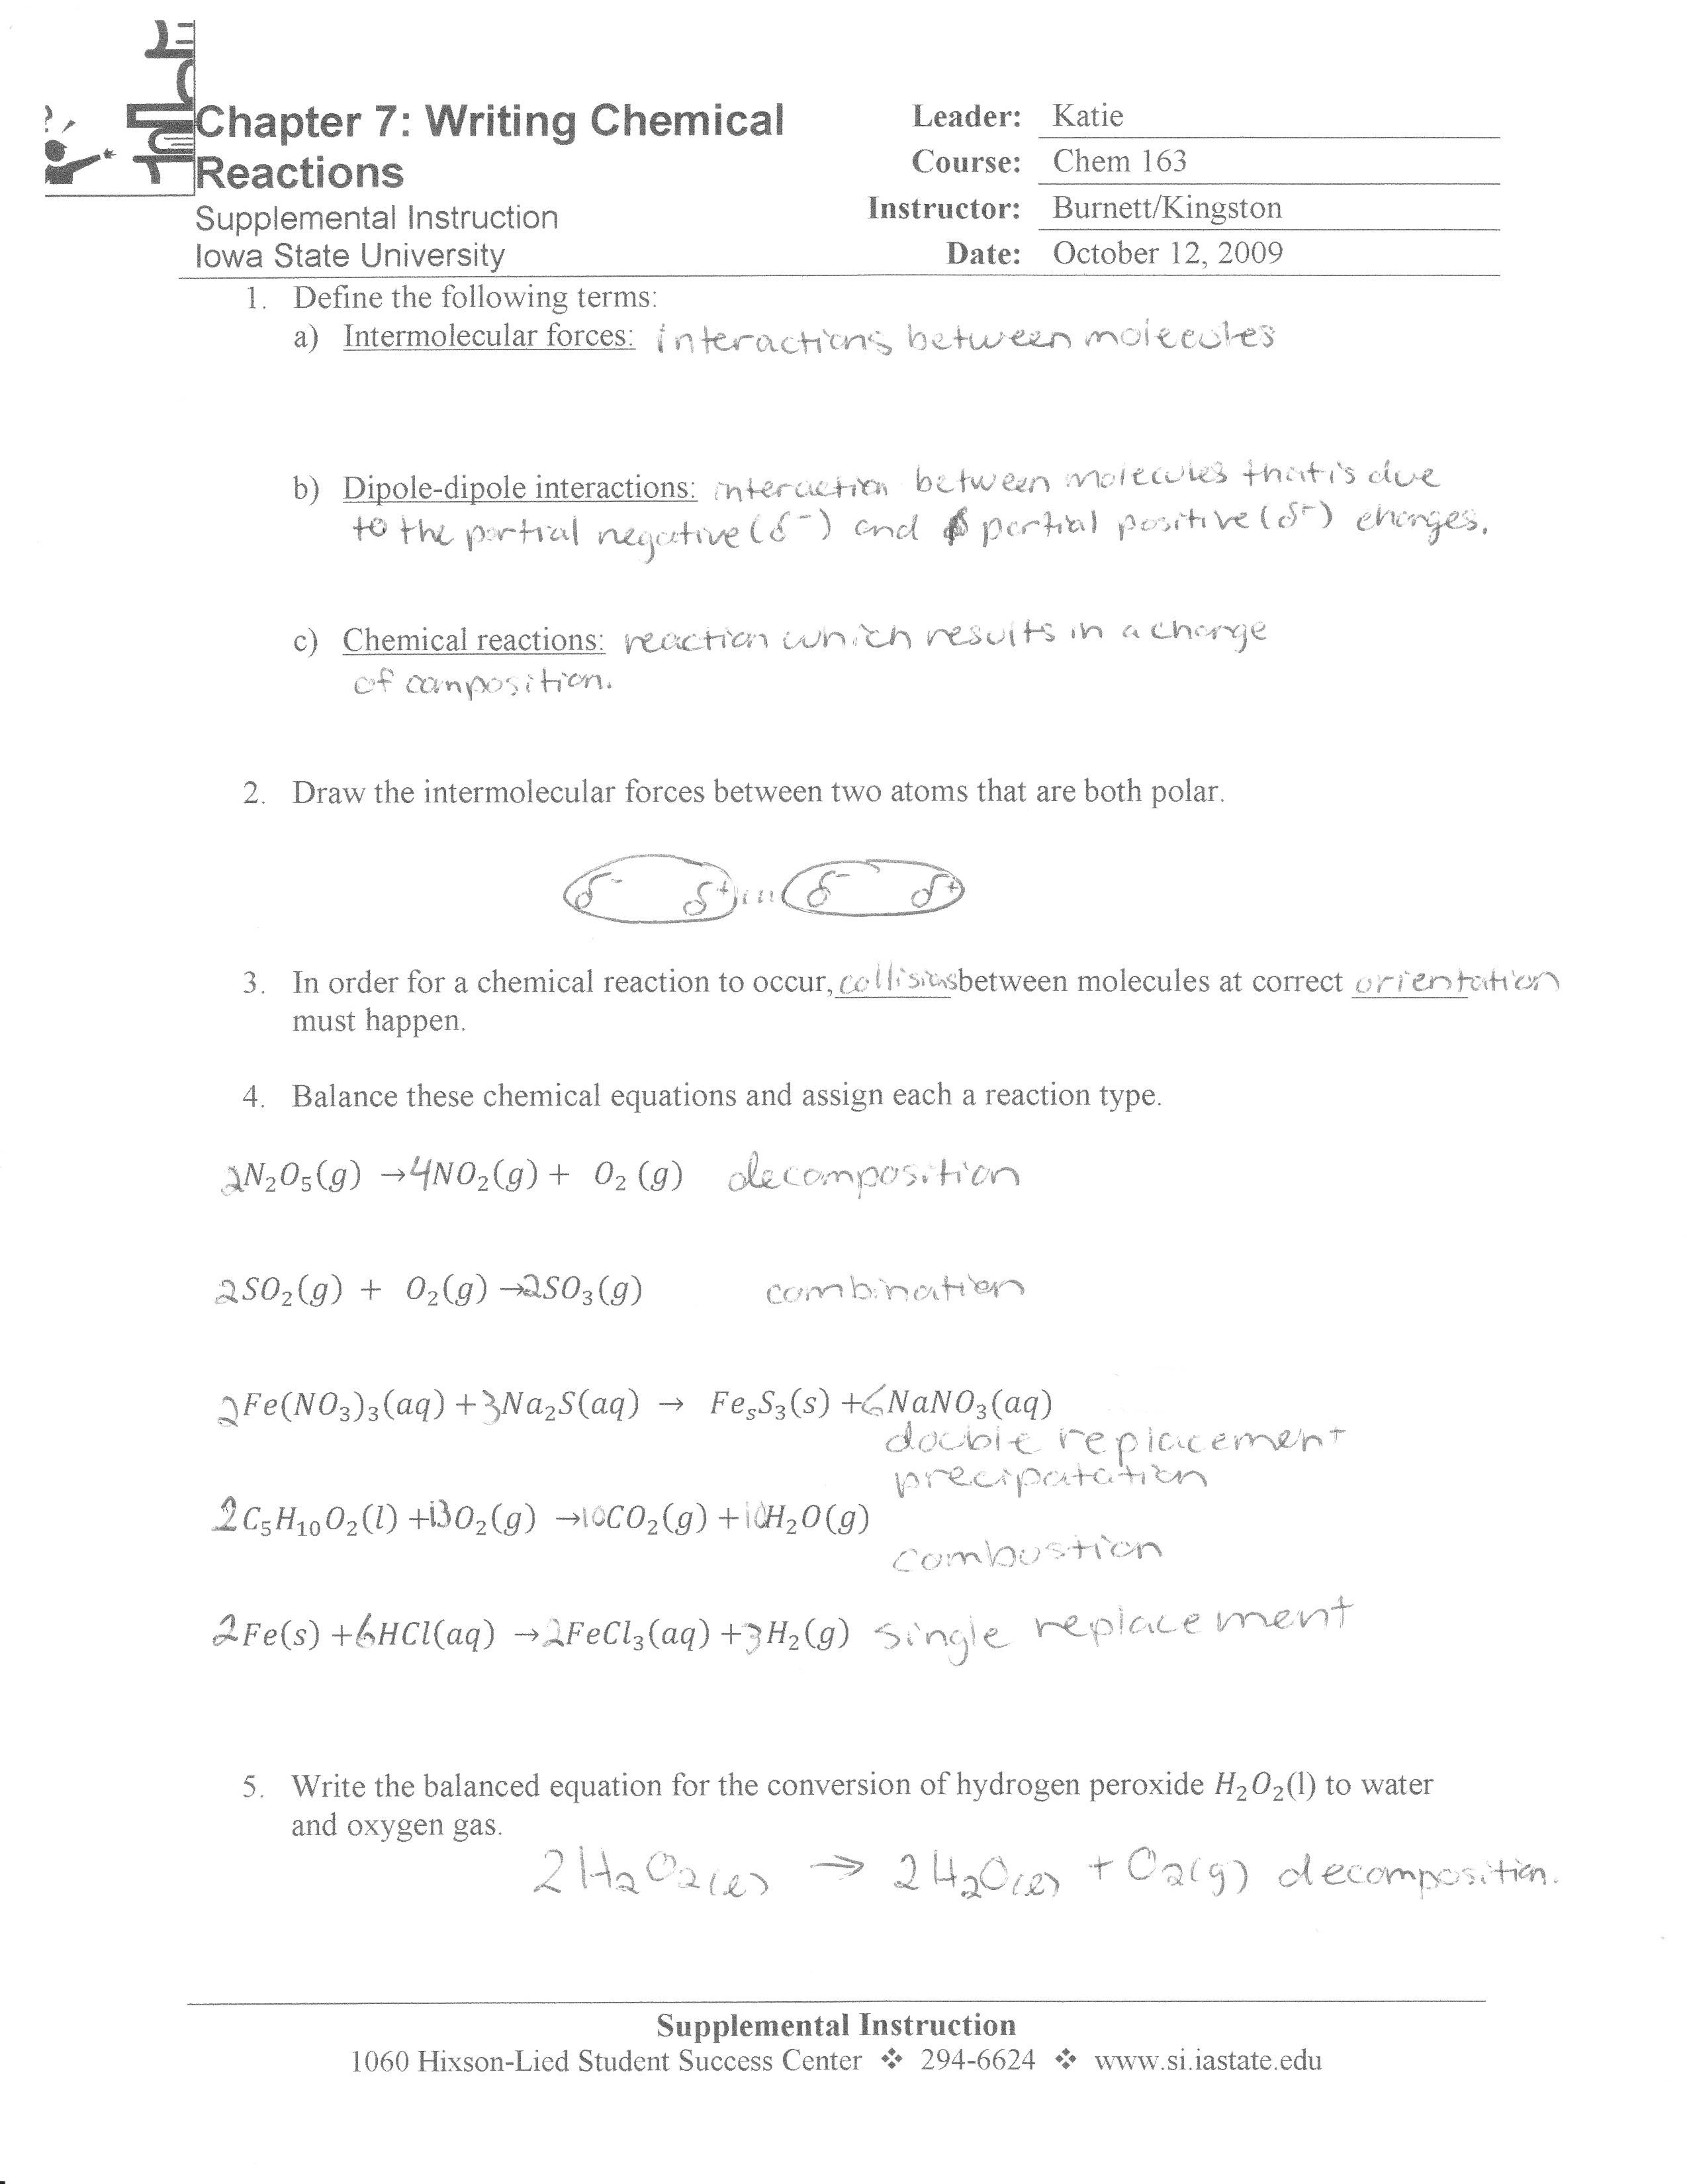 Chem 163 Supplemental Instruction